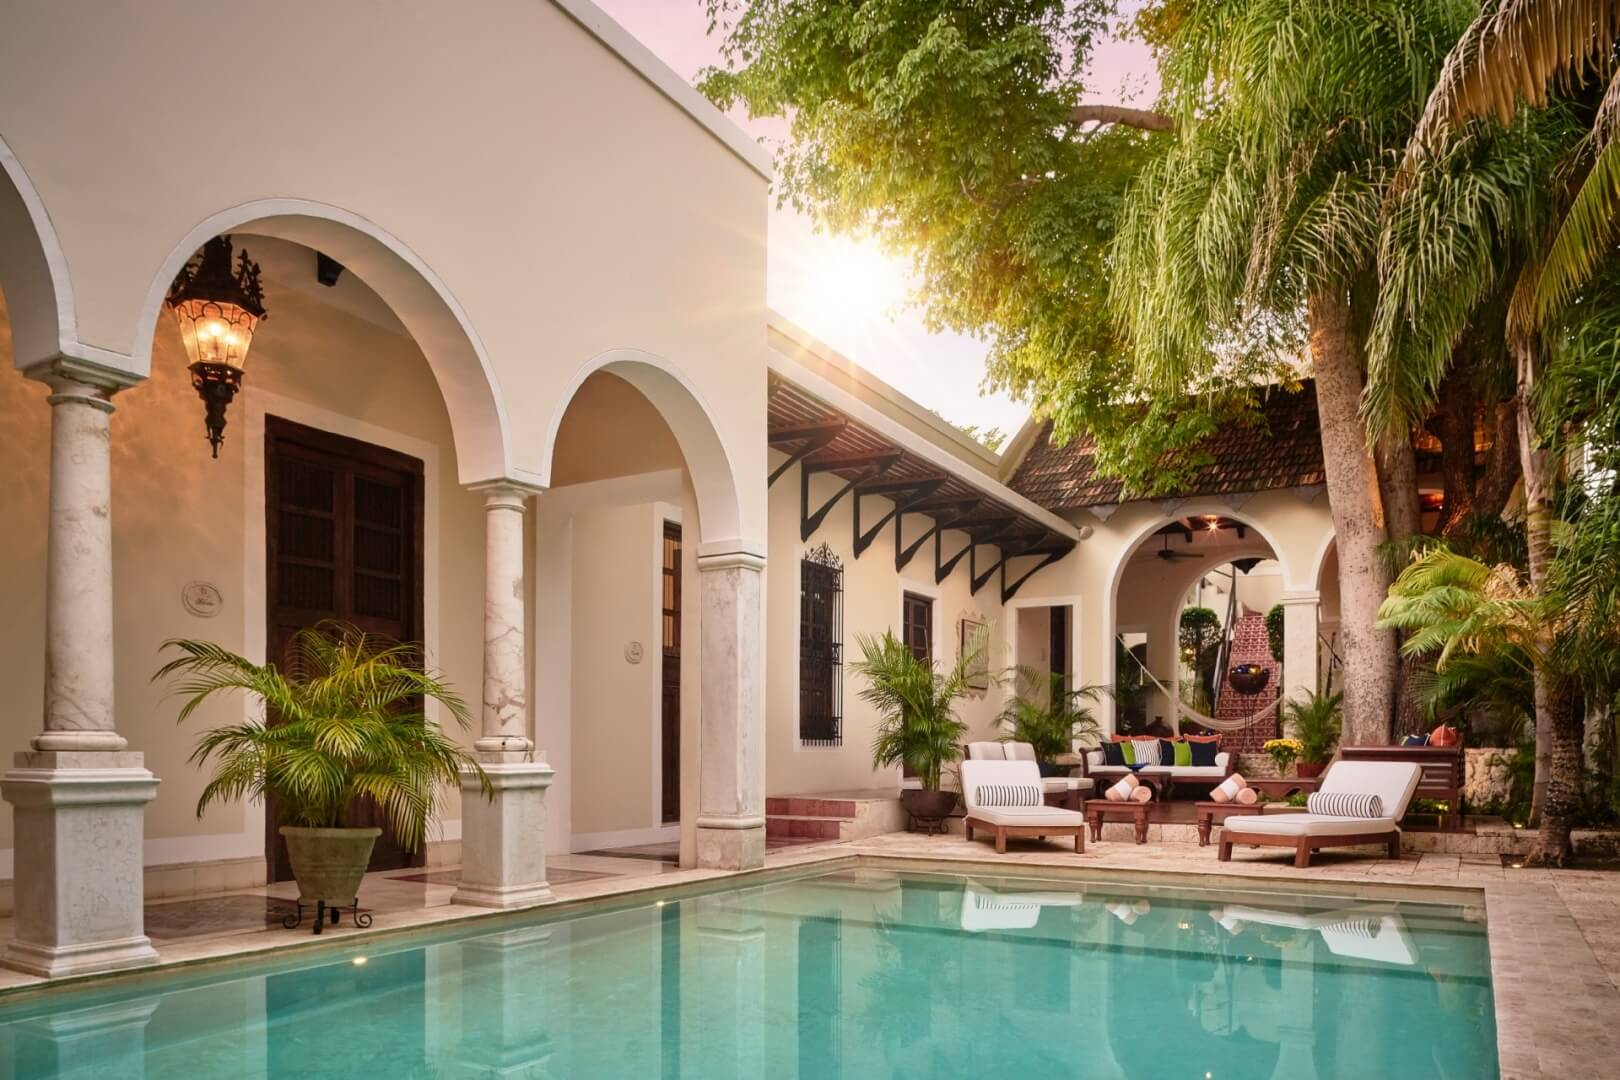 Casa Lecanda Pool